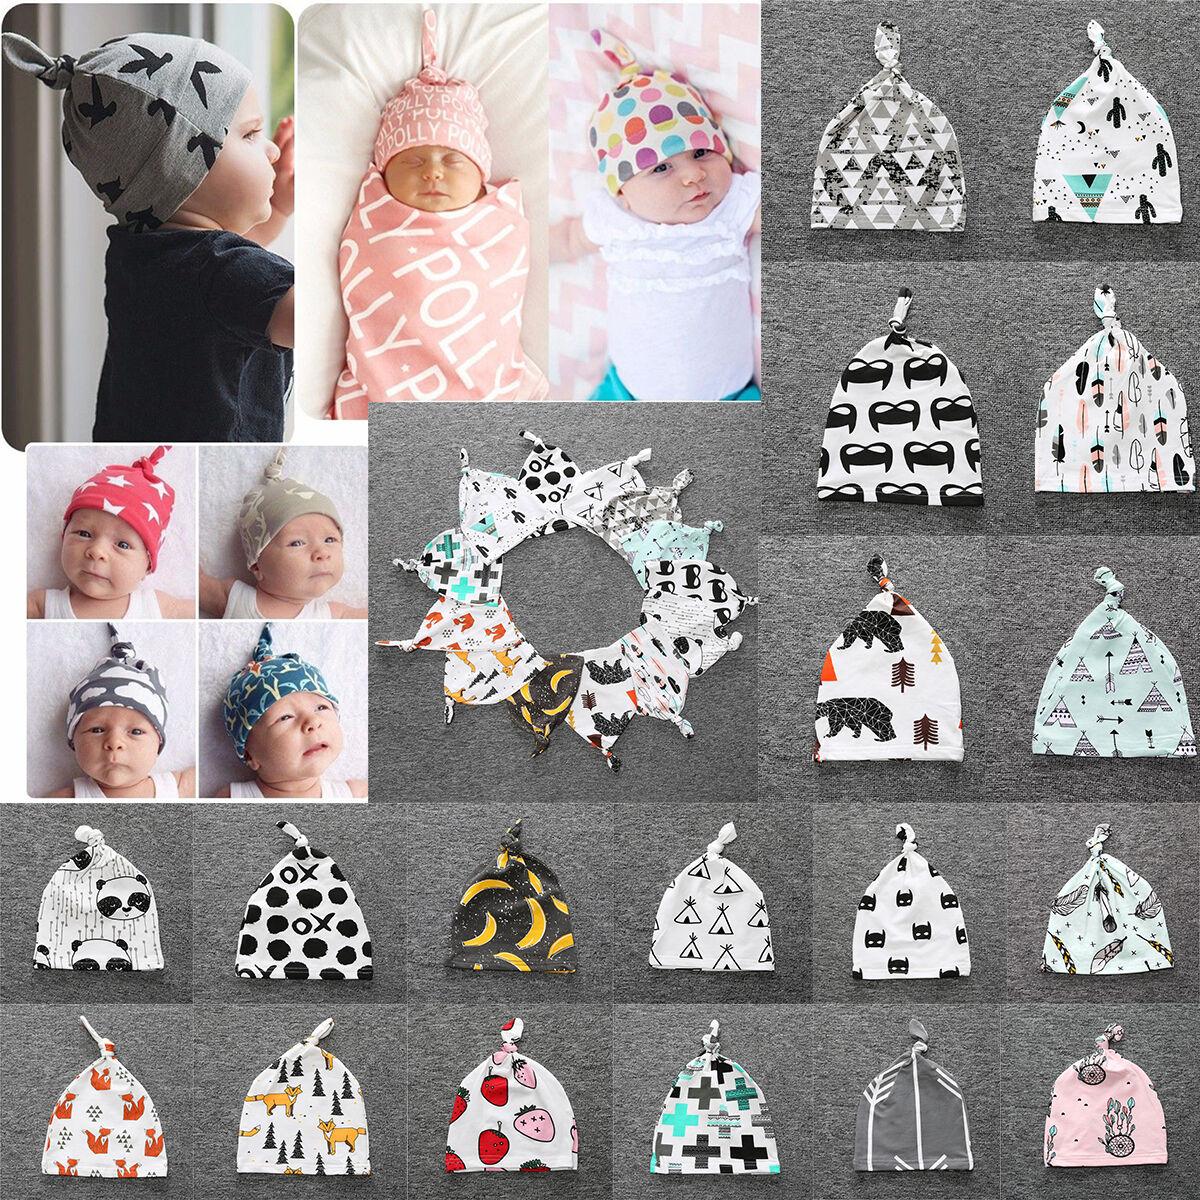 8983805f2a5 Details about Baby Newborn Girls Boys Infant Toddler Cartoon Beanie Cotton  Hat Cap Warm Hats